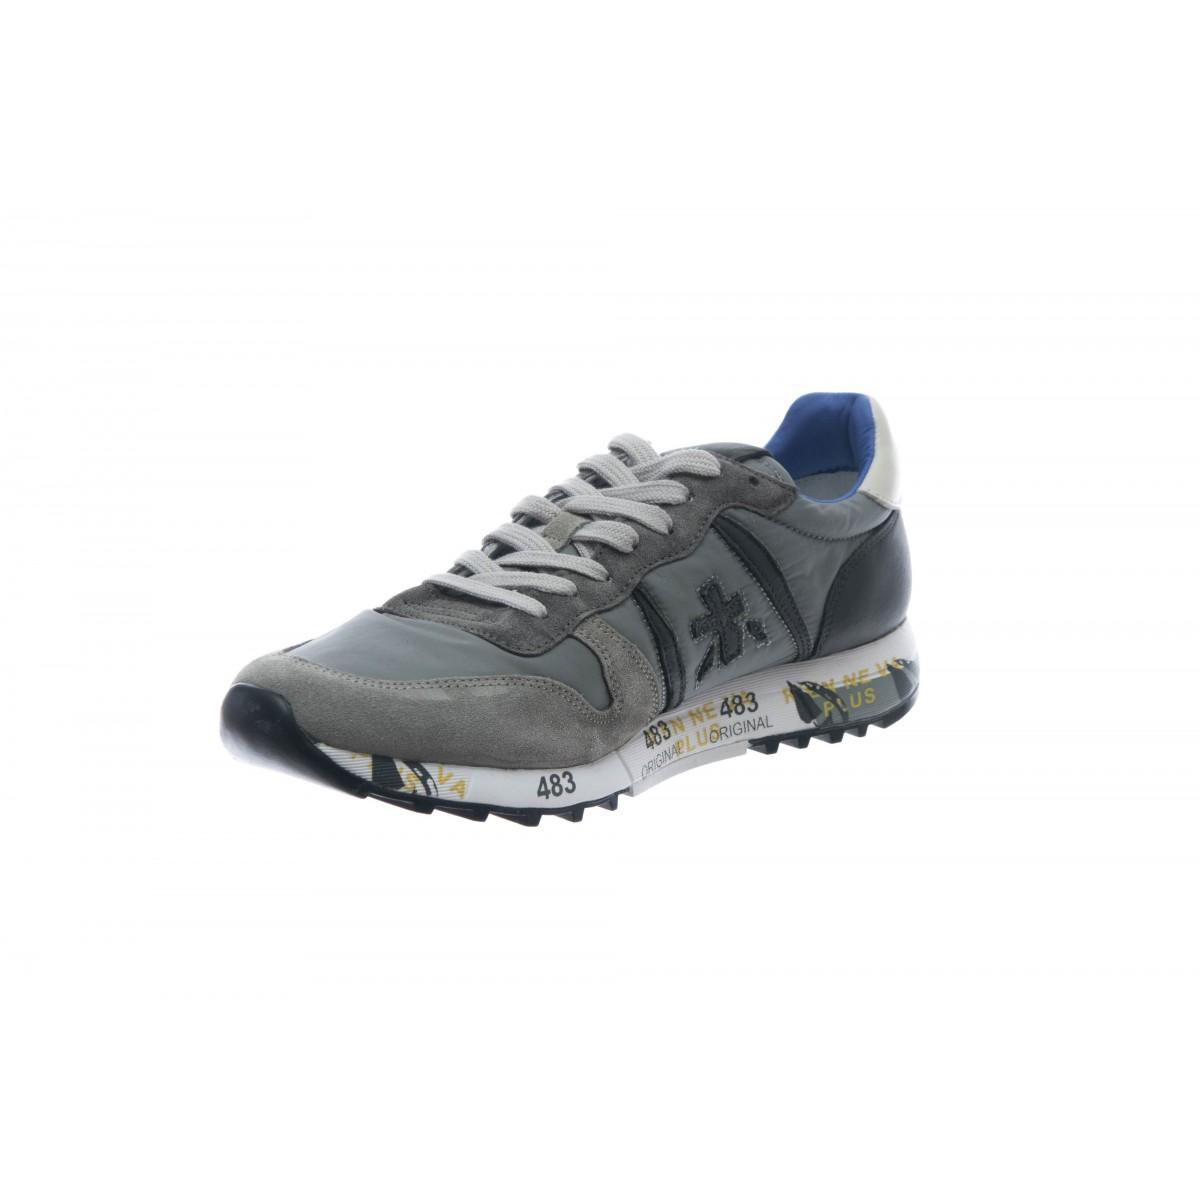 Scarpe - Eric 3818 sneakers uomo